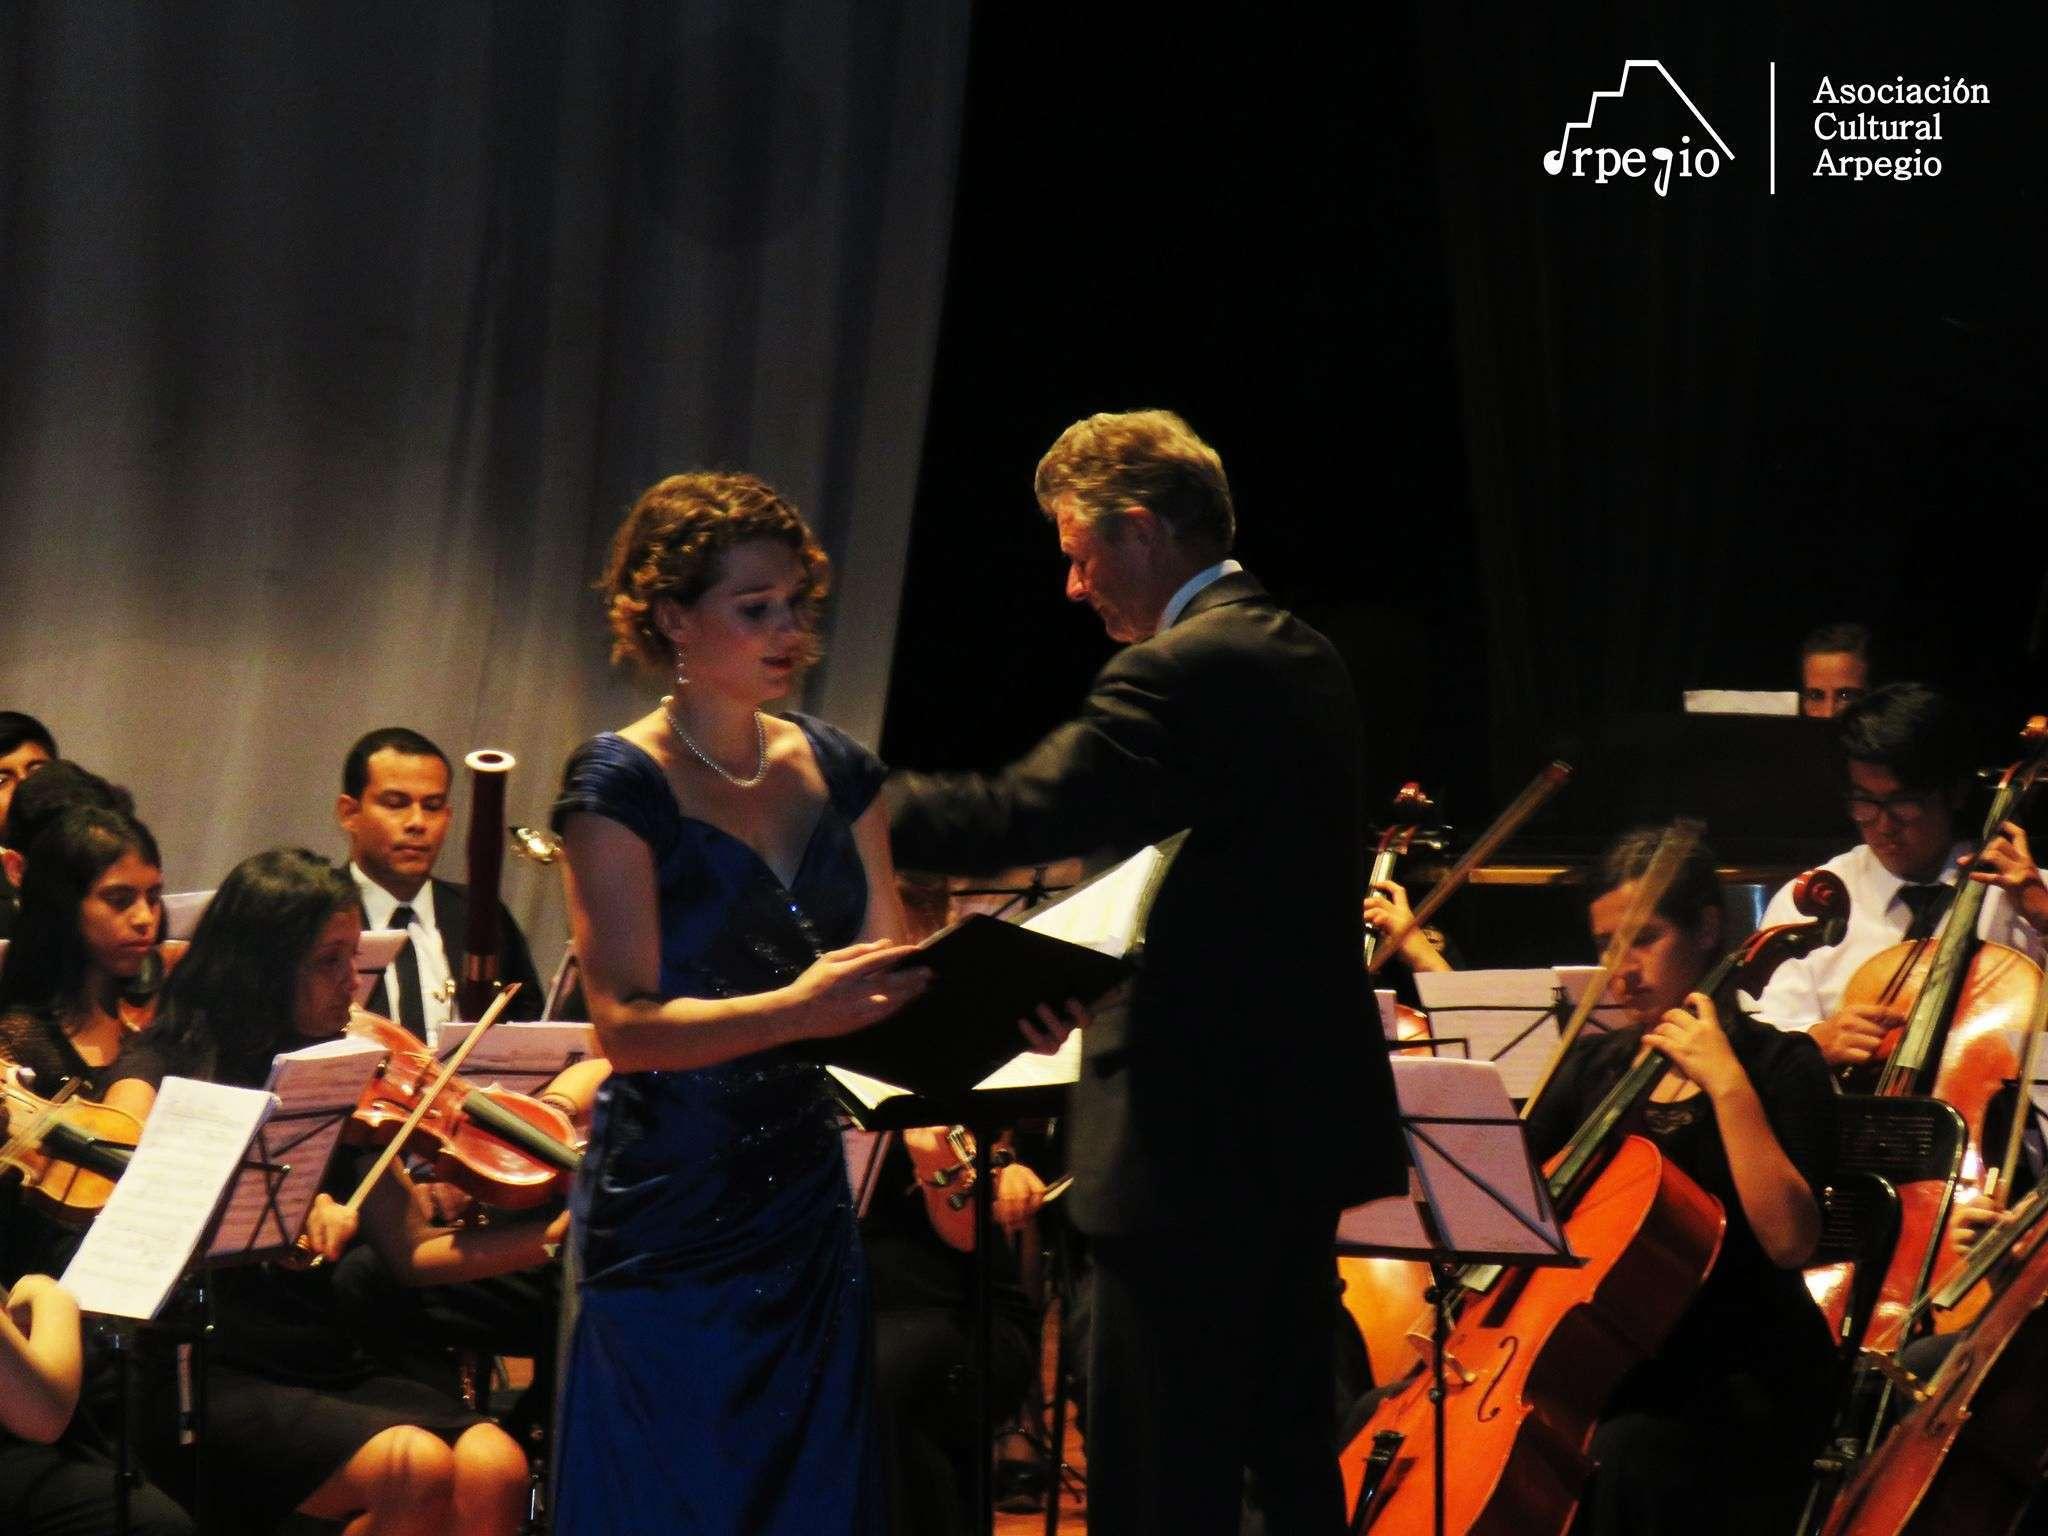 ORQUESTA DE BARRO - G. MAHLER SINFONÍA n.º 4